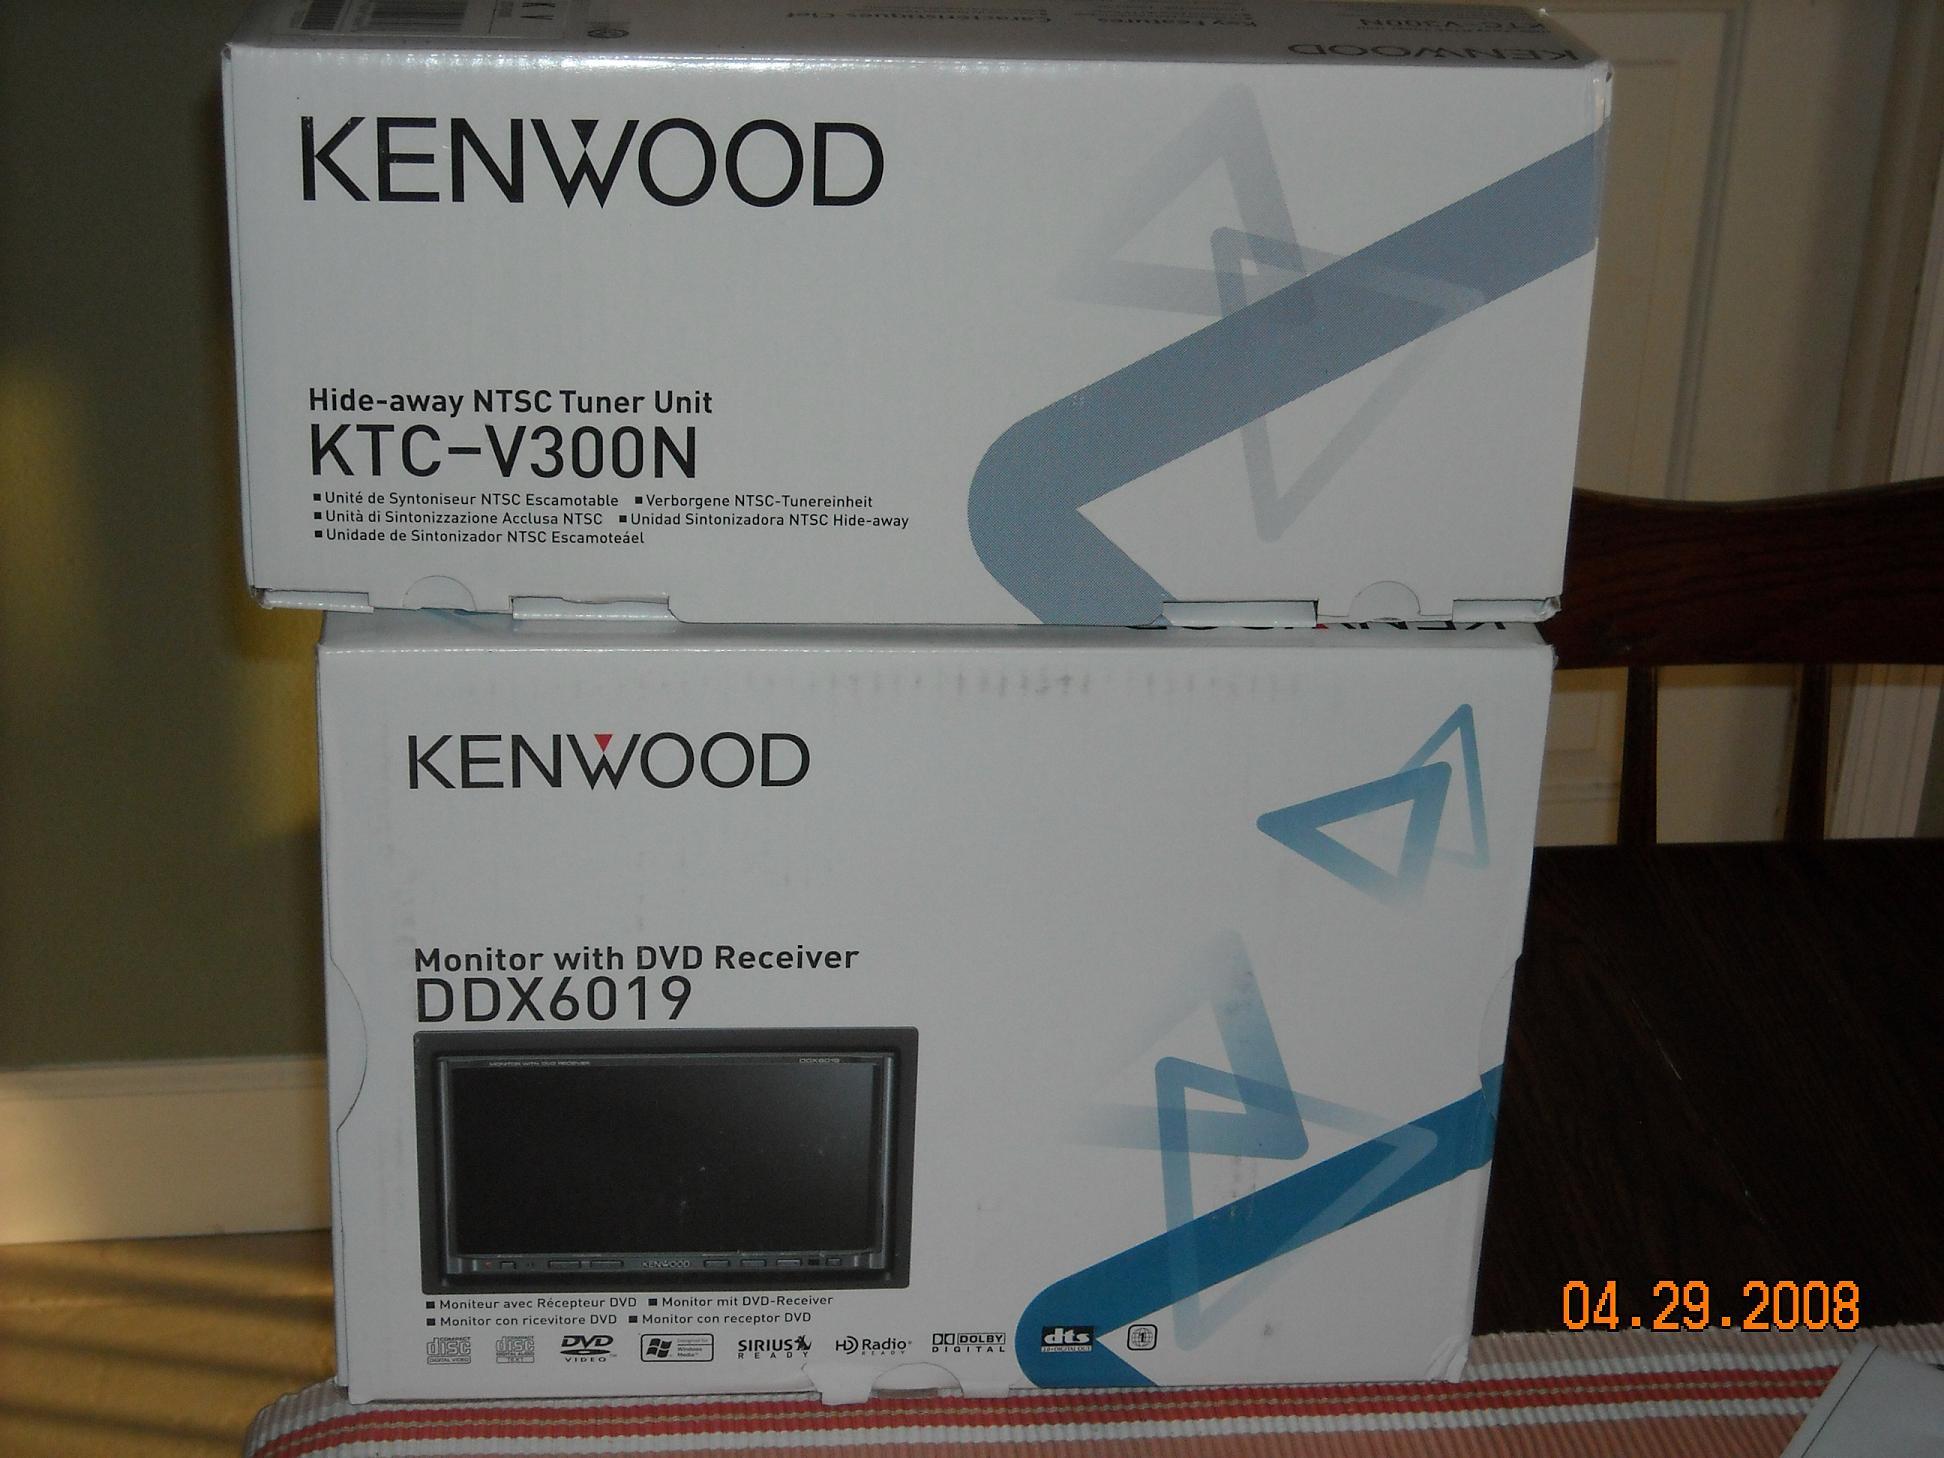 Diagram Collection Kenwood Ddx6019 Instructions - Millions ... on kenwood ddx6019 screen replacement, kenwood in-dash dvd, kenwood ddx6019 remote control, kenwood car stereo dvd,